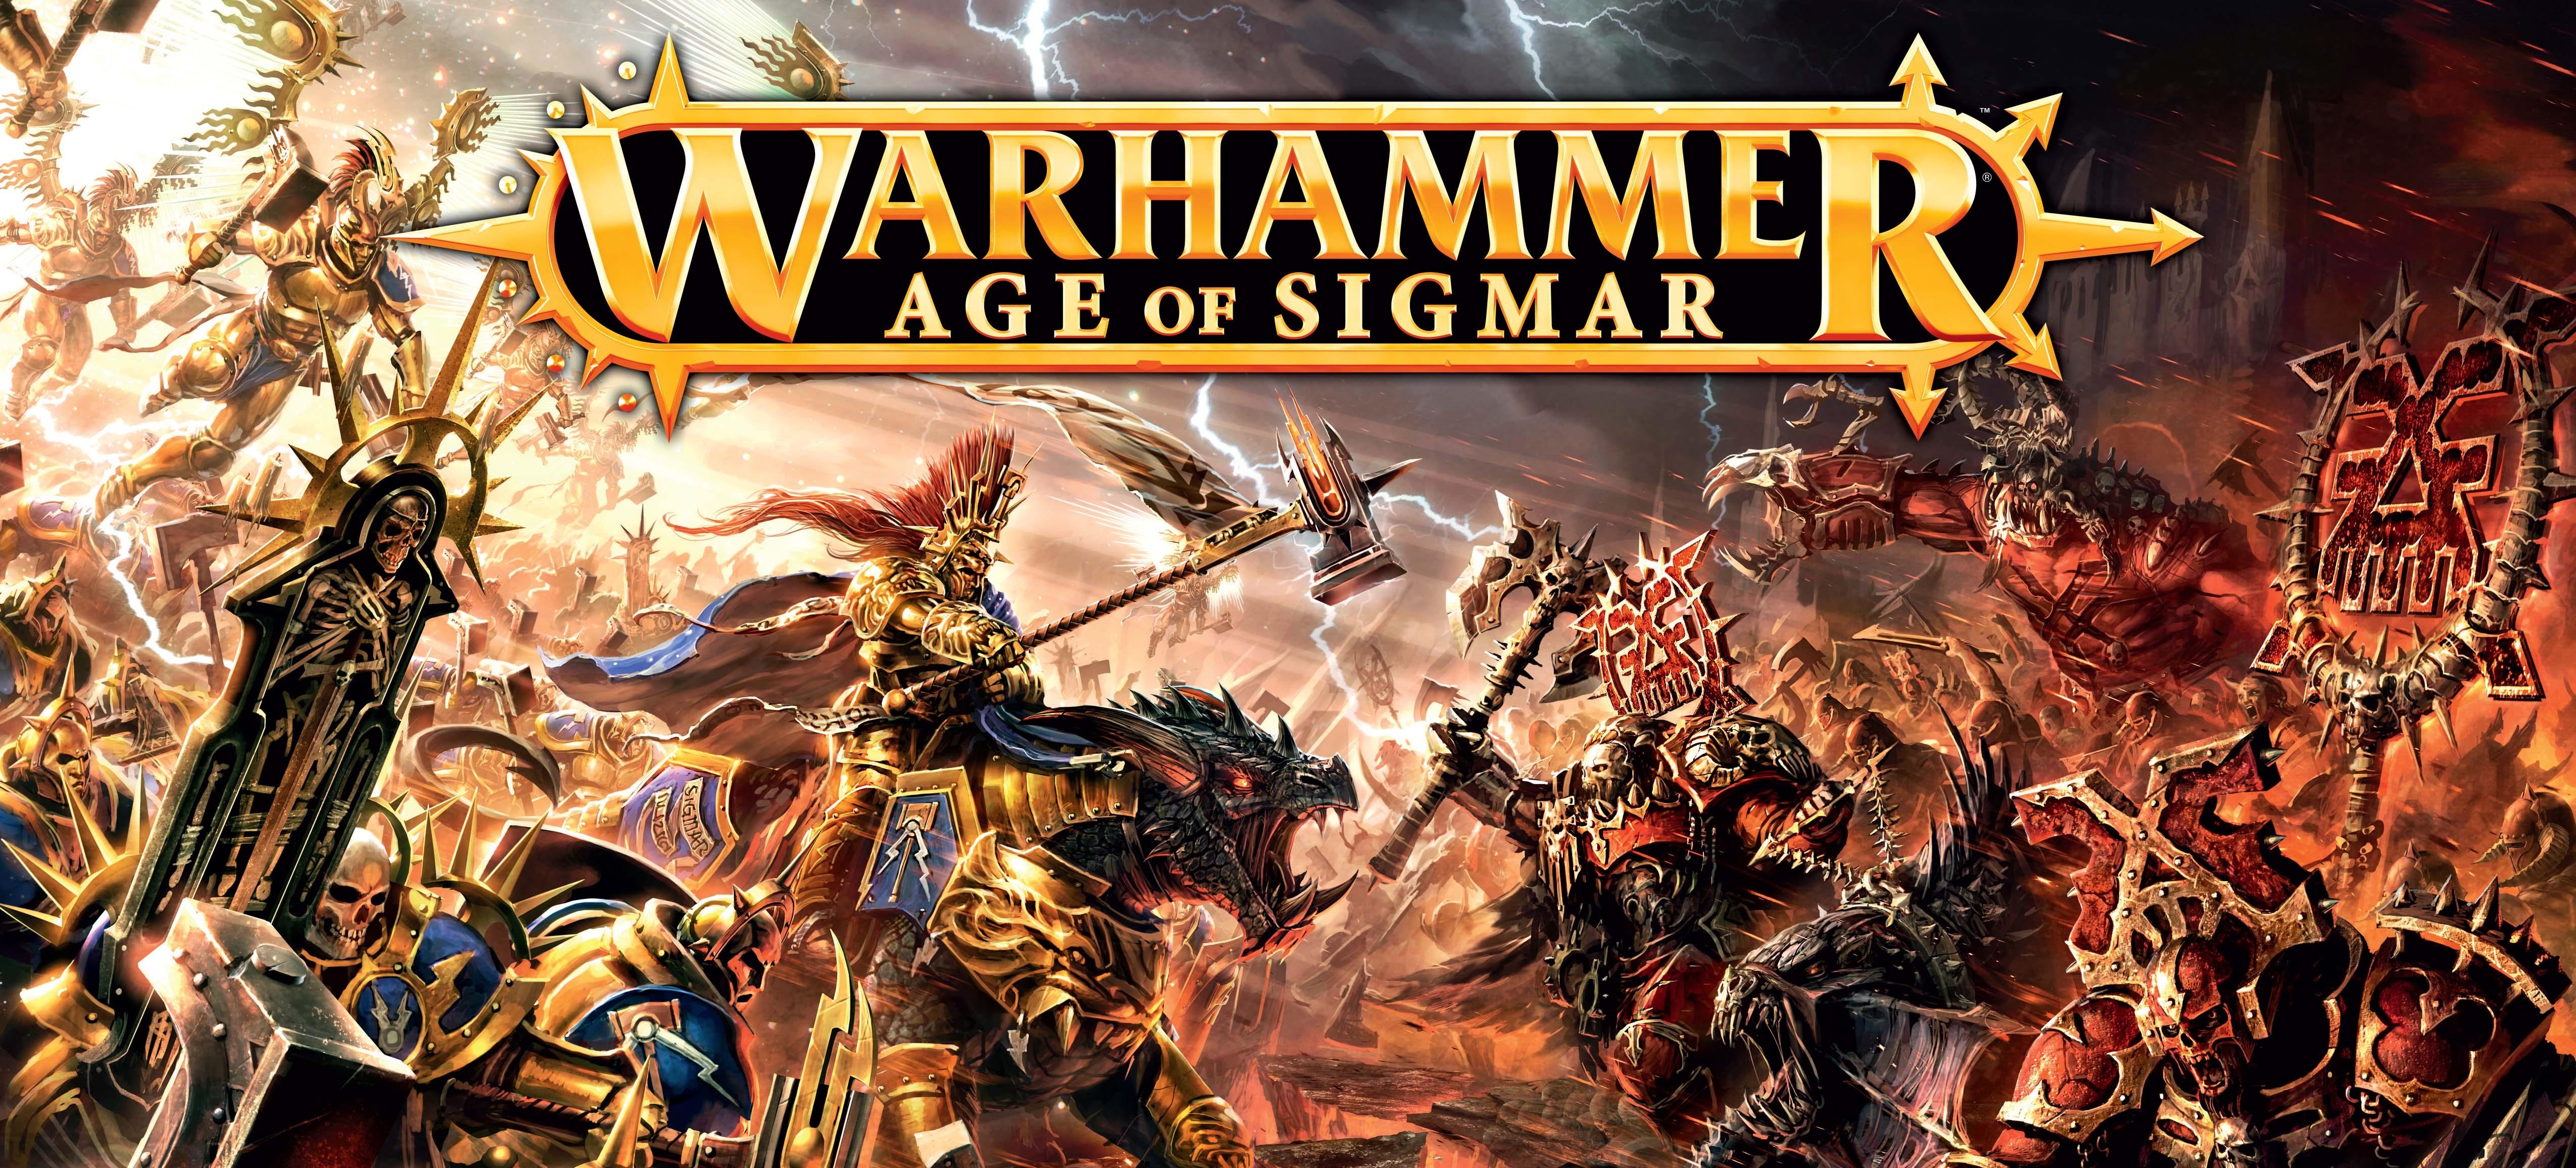 Warhammer_age_of_sigmar_cover4.jpg